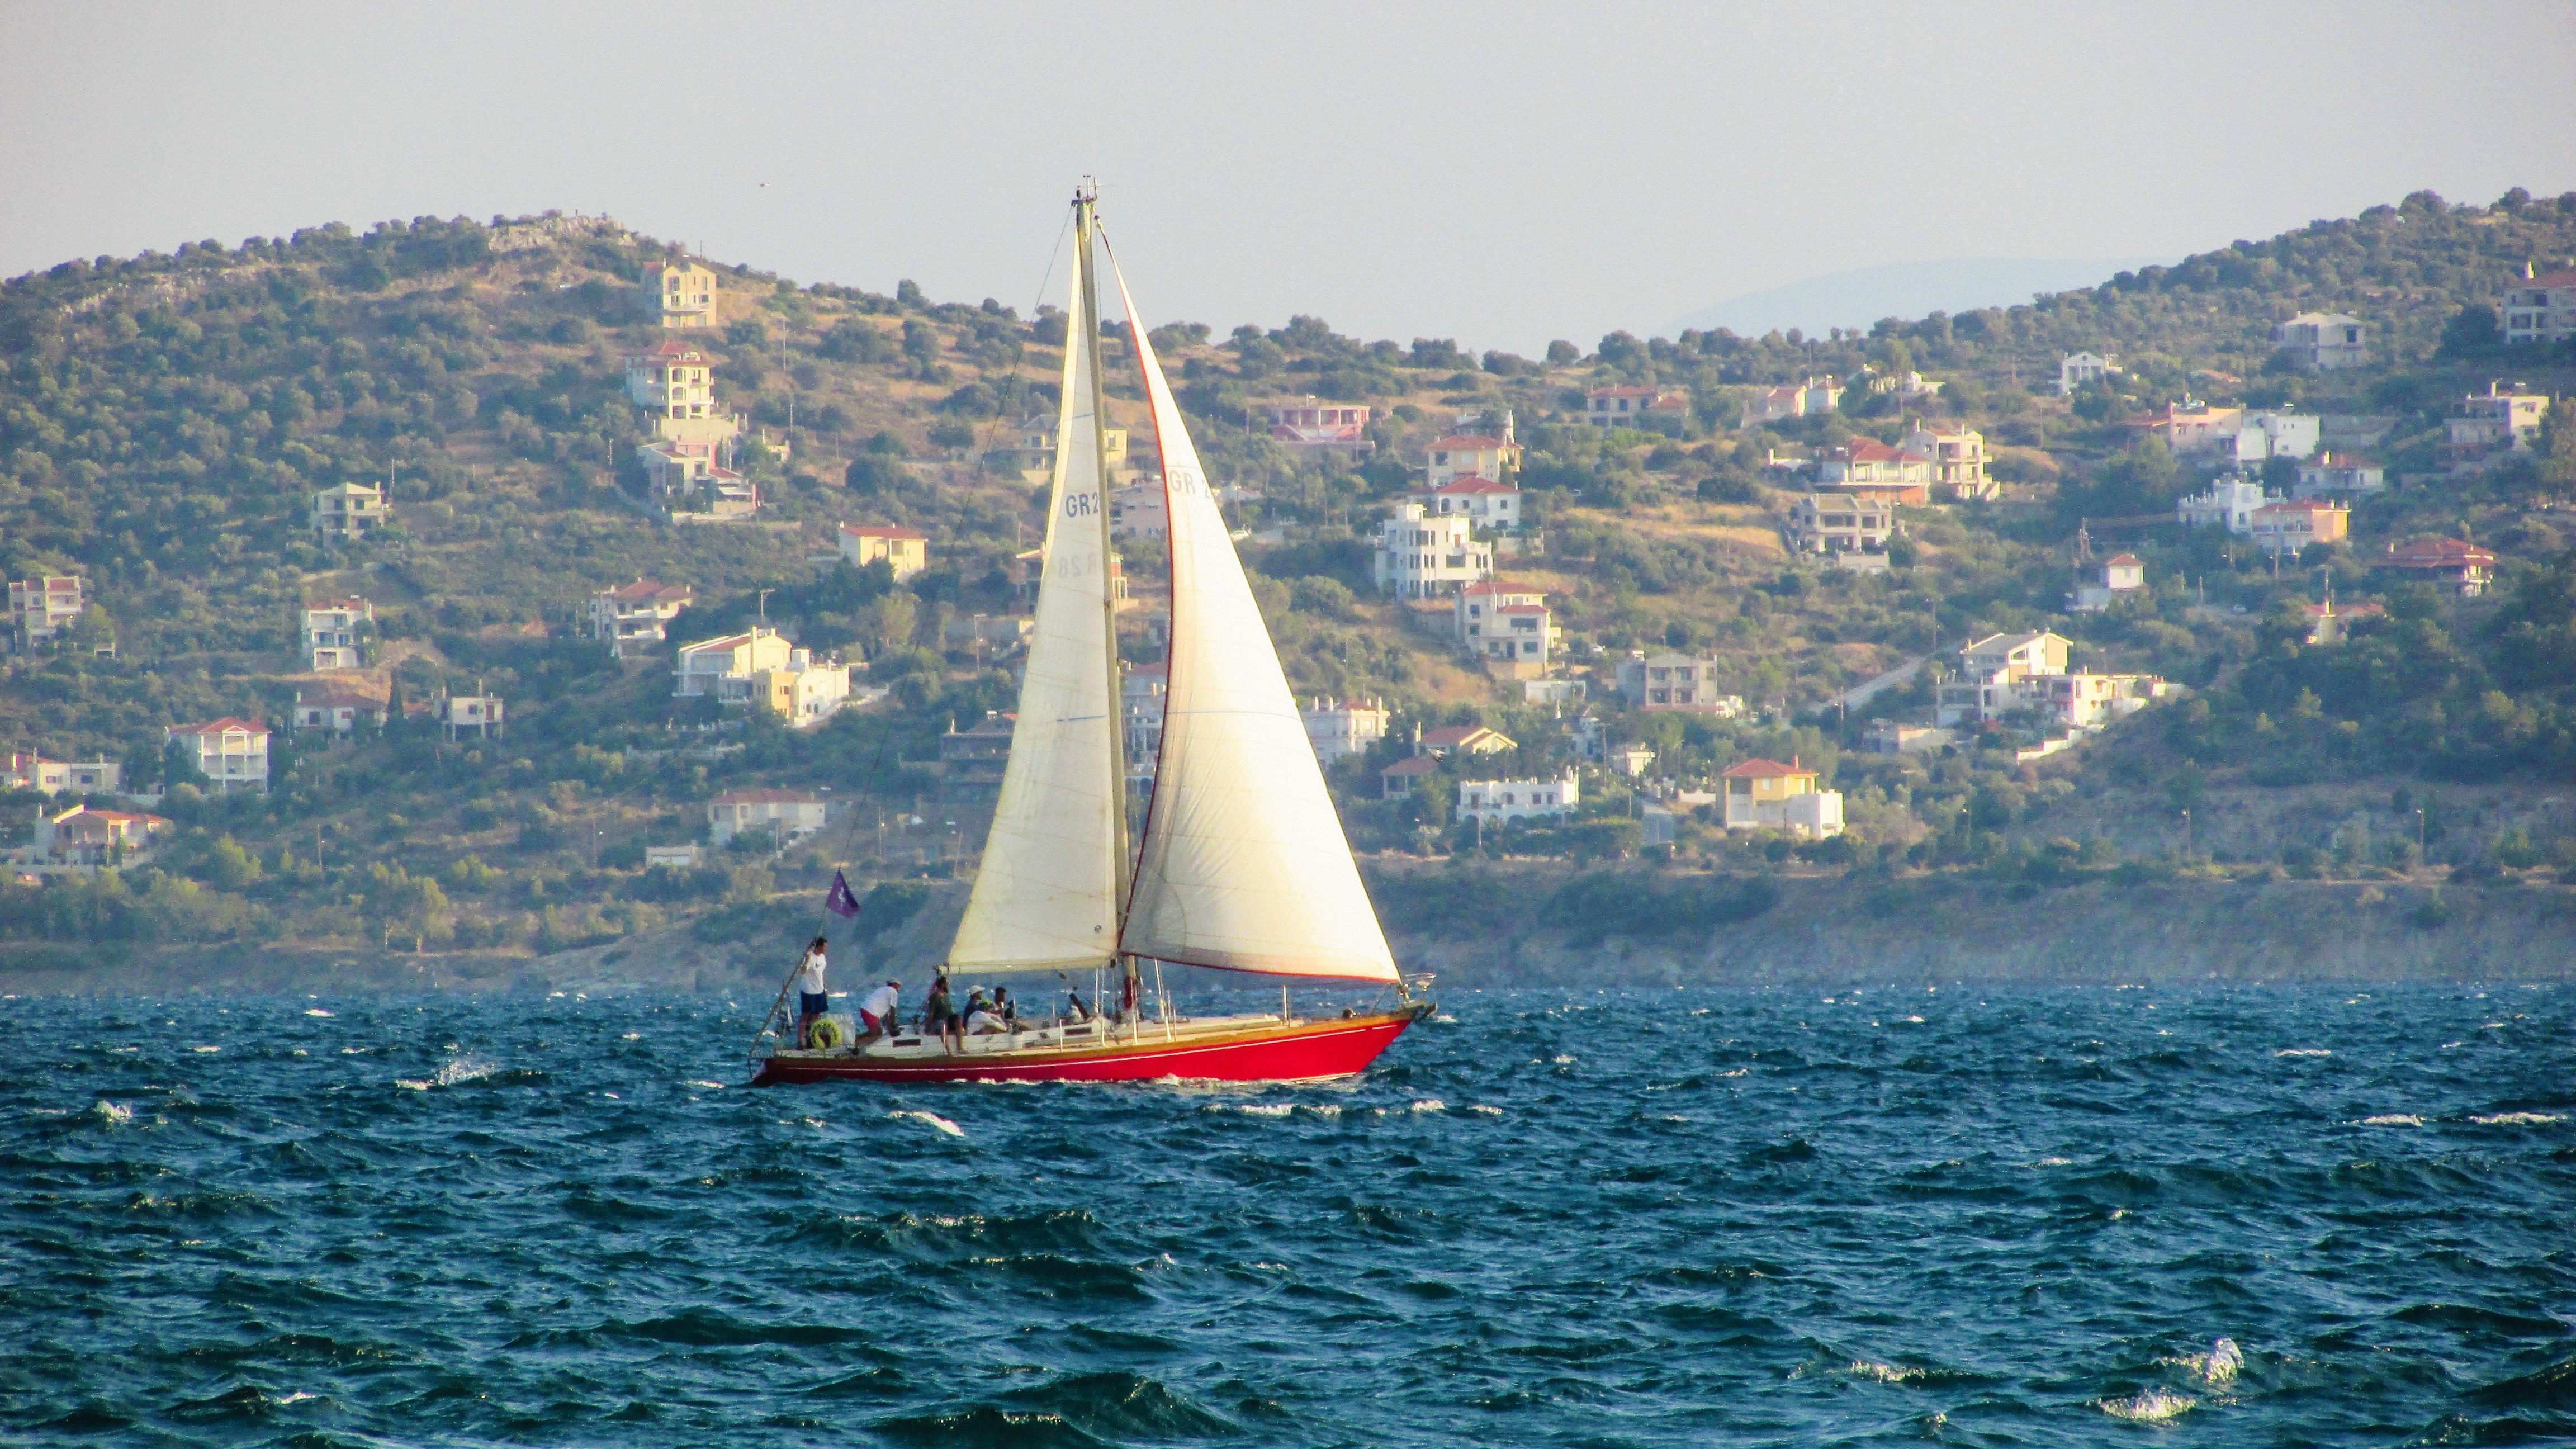 Segelschiffe auf dem meer  Kostenlose foto : Meer, Boot, Wind, Schiff, Sommer-, Erholung ...